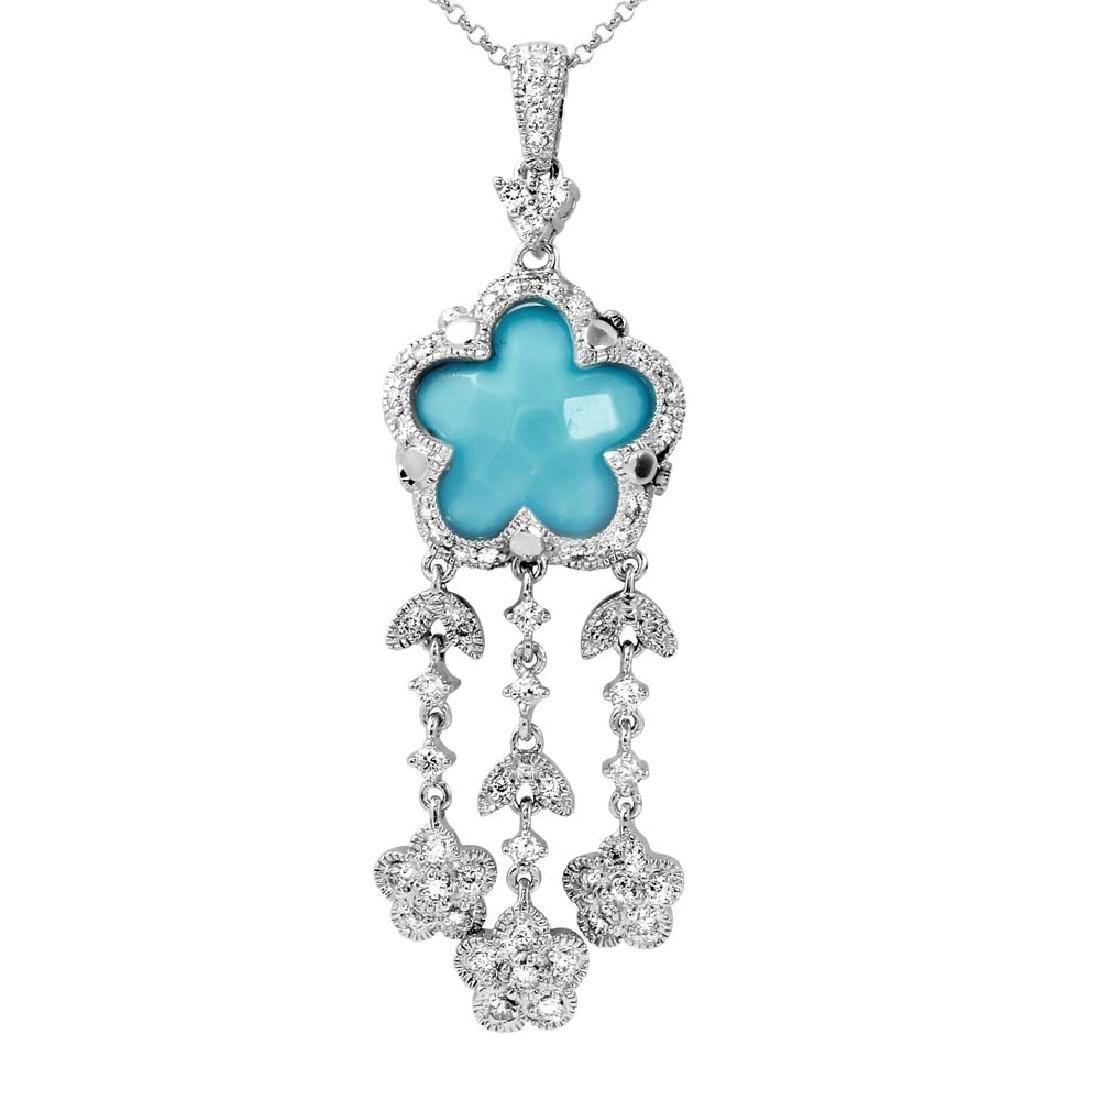 Genuine 5.34 TCW 14K White Gold Ladies Necklace